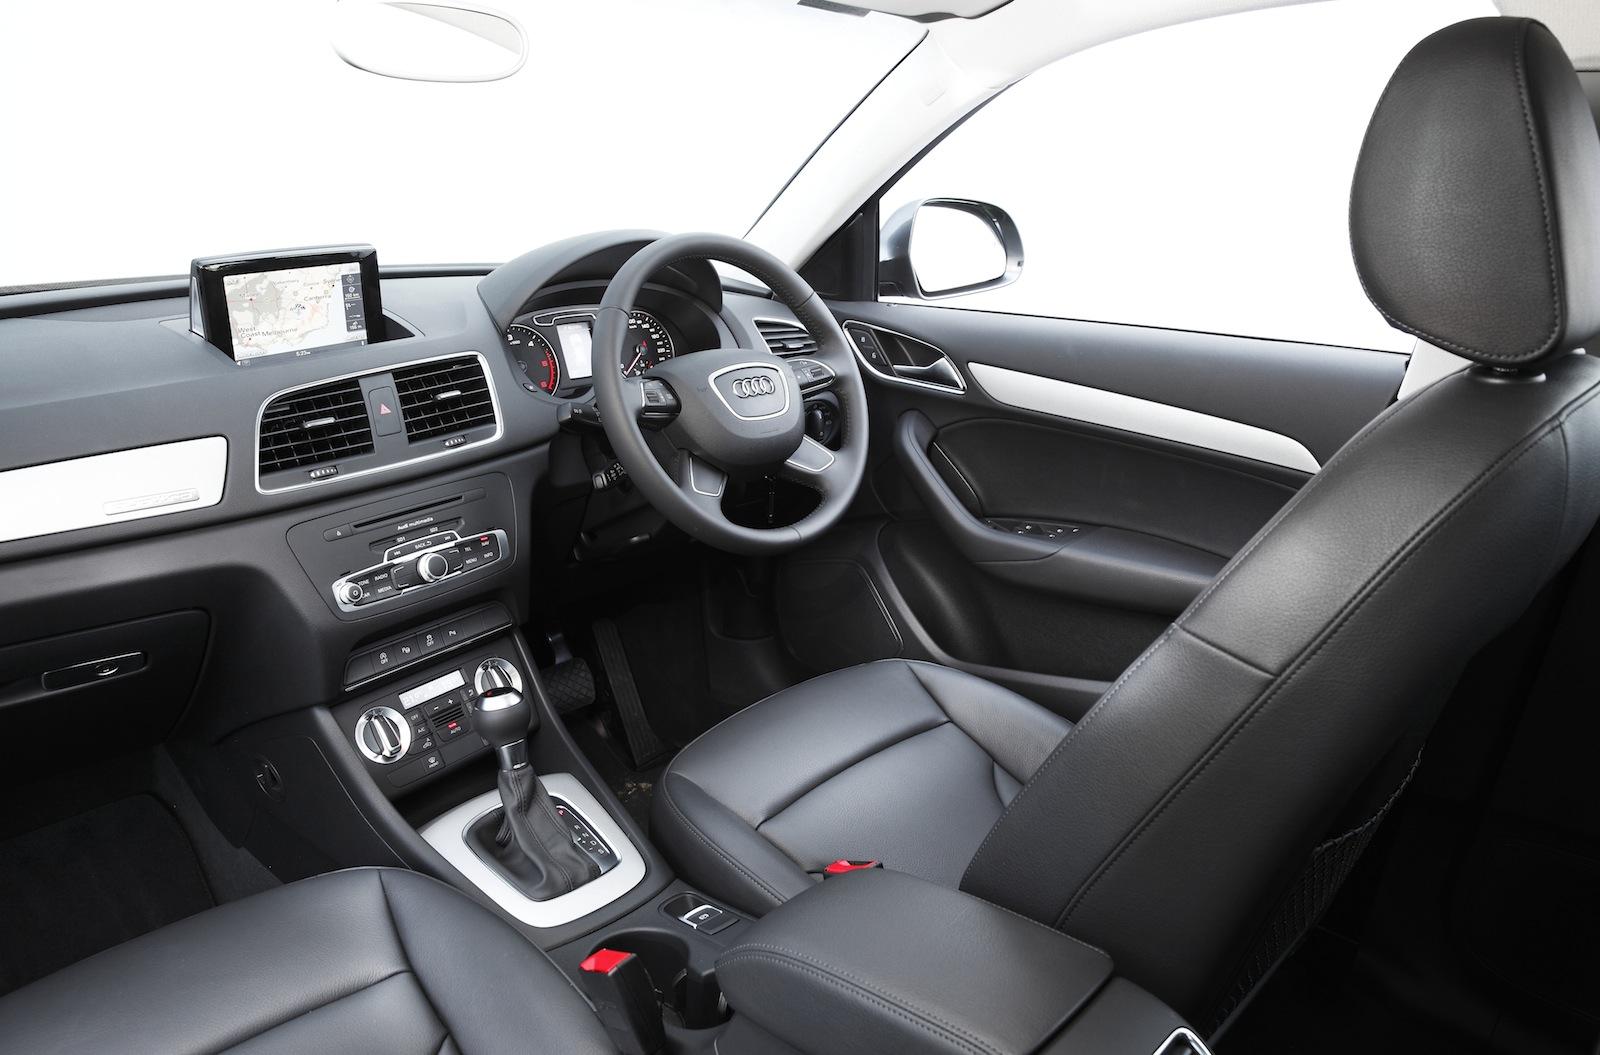 Audi Q Gets New Base Model Quattroonly Range Photos Of - Audi base model